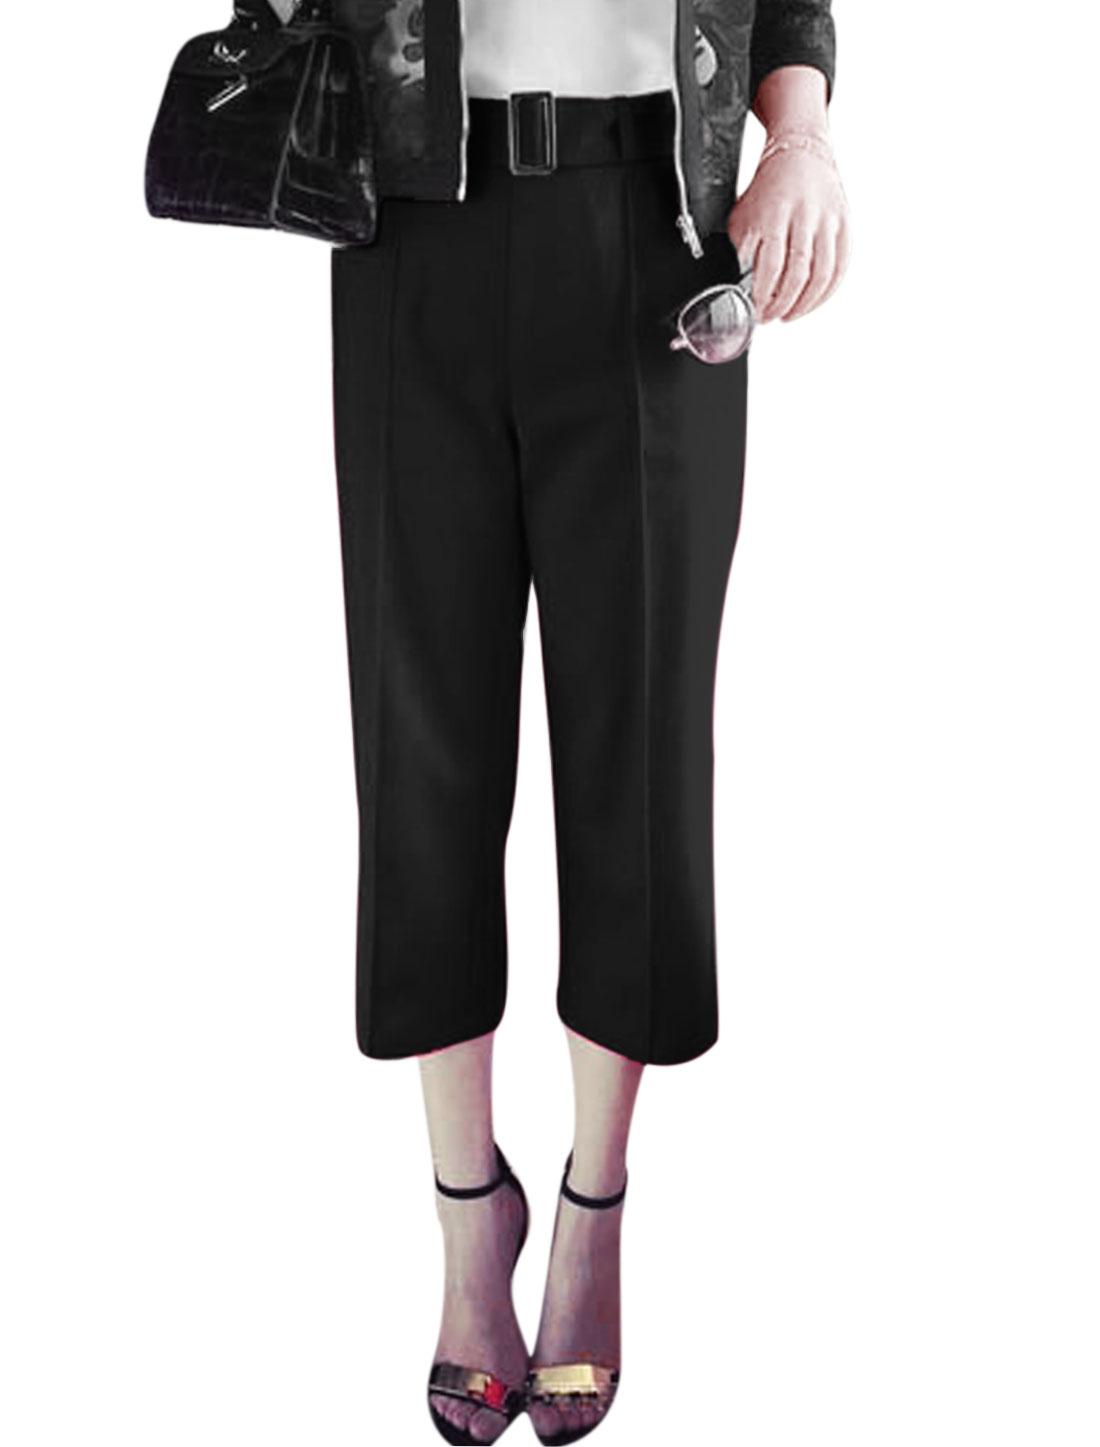 Ladies High Rise Zipper Side Cropped Pants w Waist Belt Black M